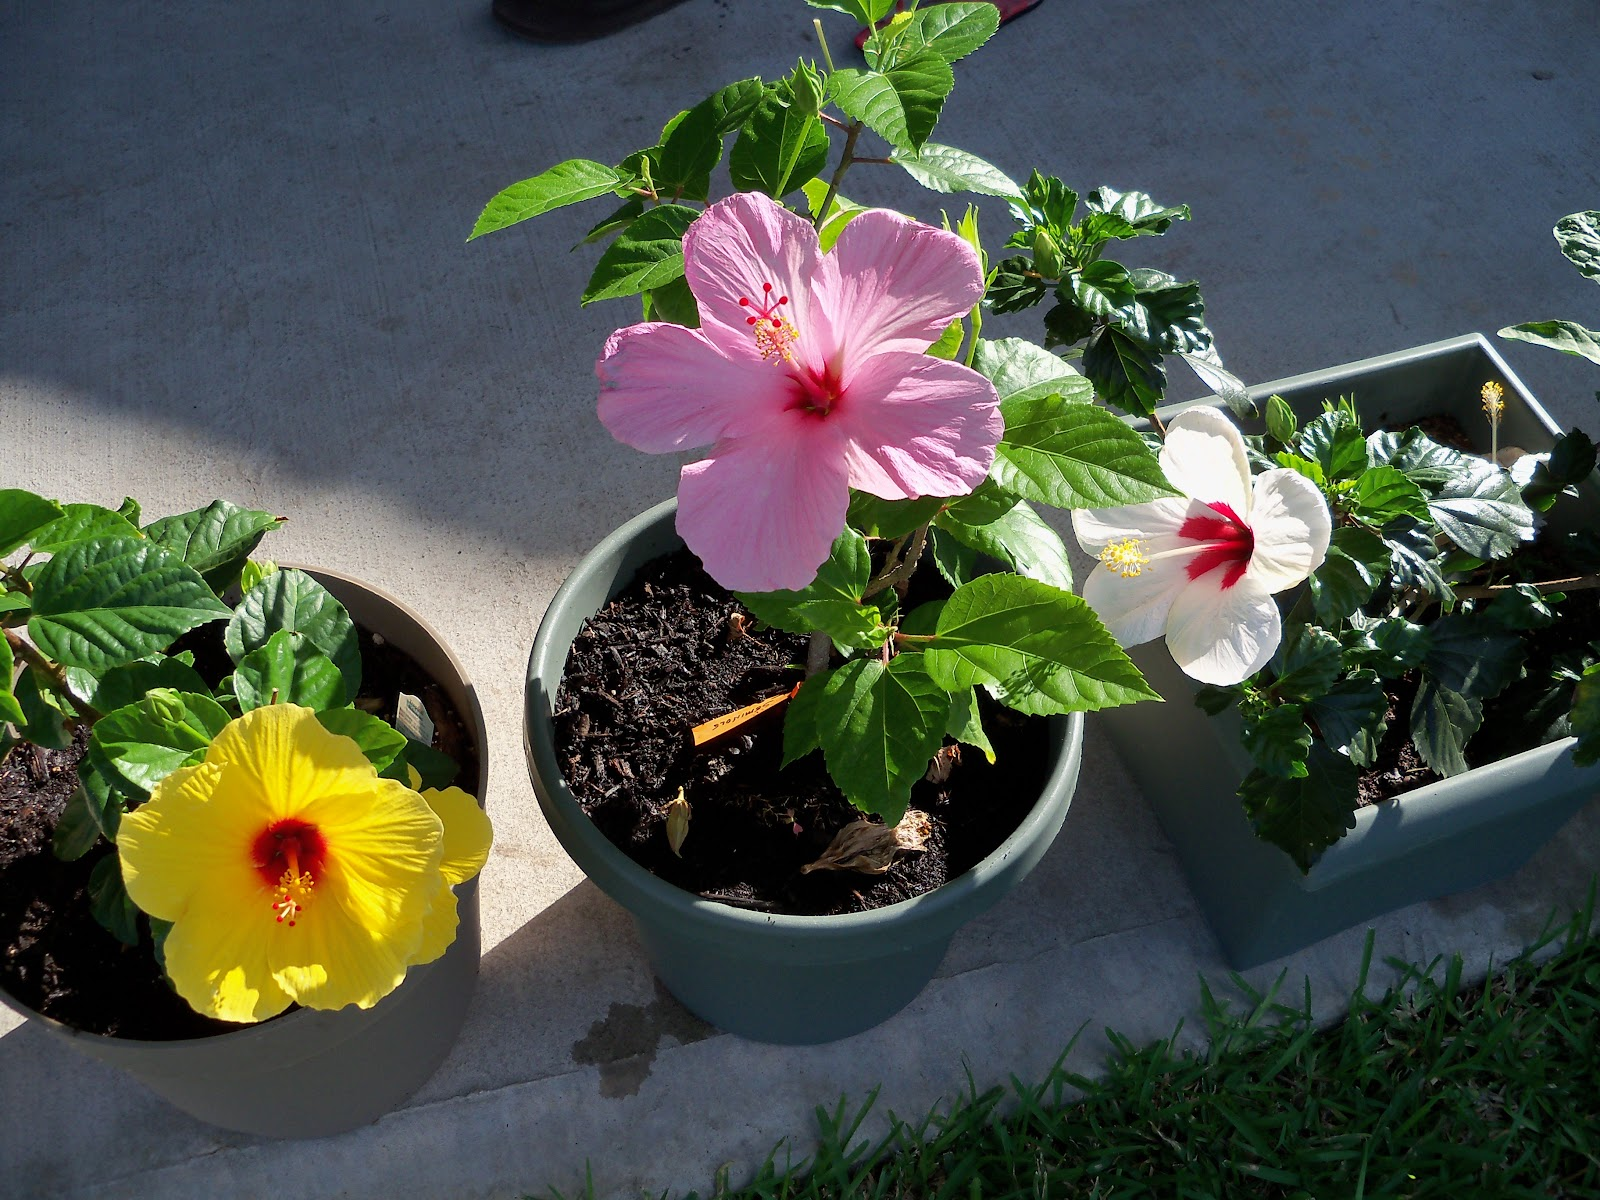 Gardening 2010, Part Two - 101_2515.JPG